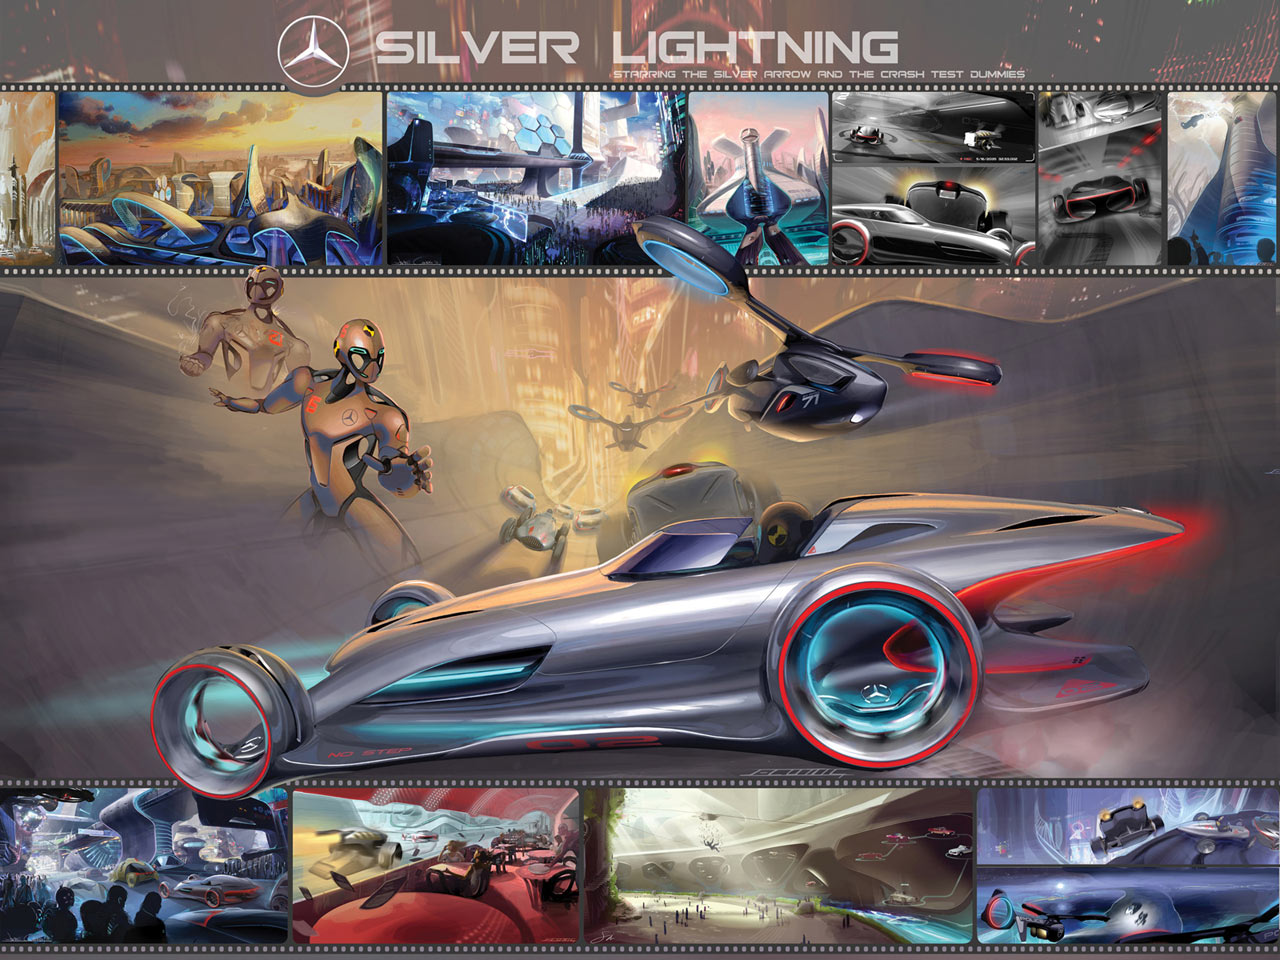 Mercedes Benz Silver Lightning Poster Detail Car Body Design